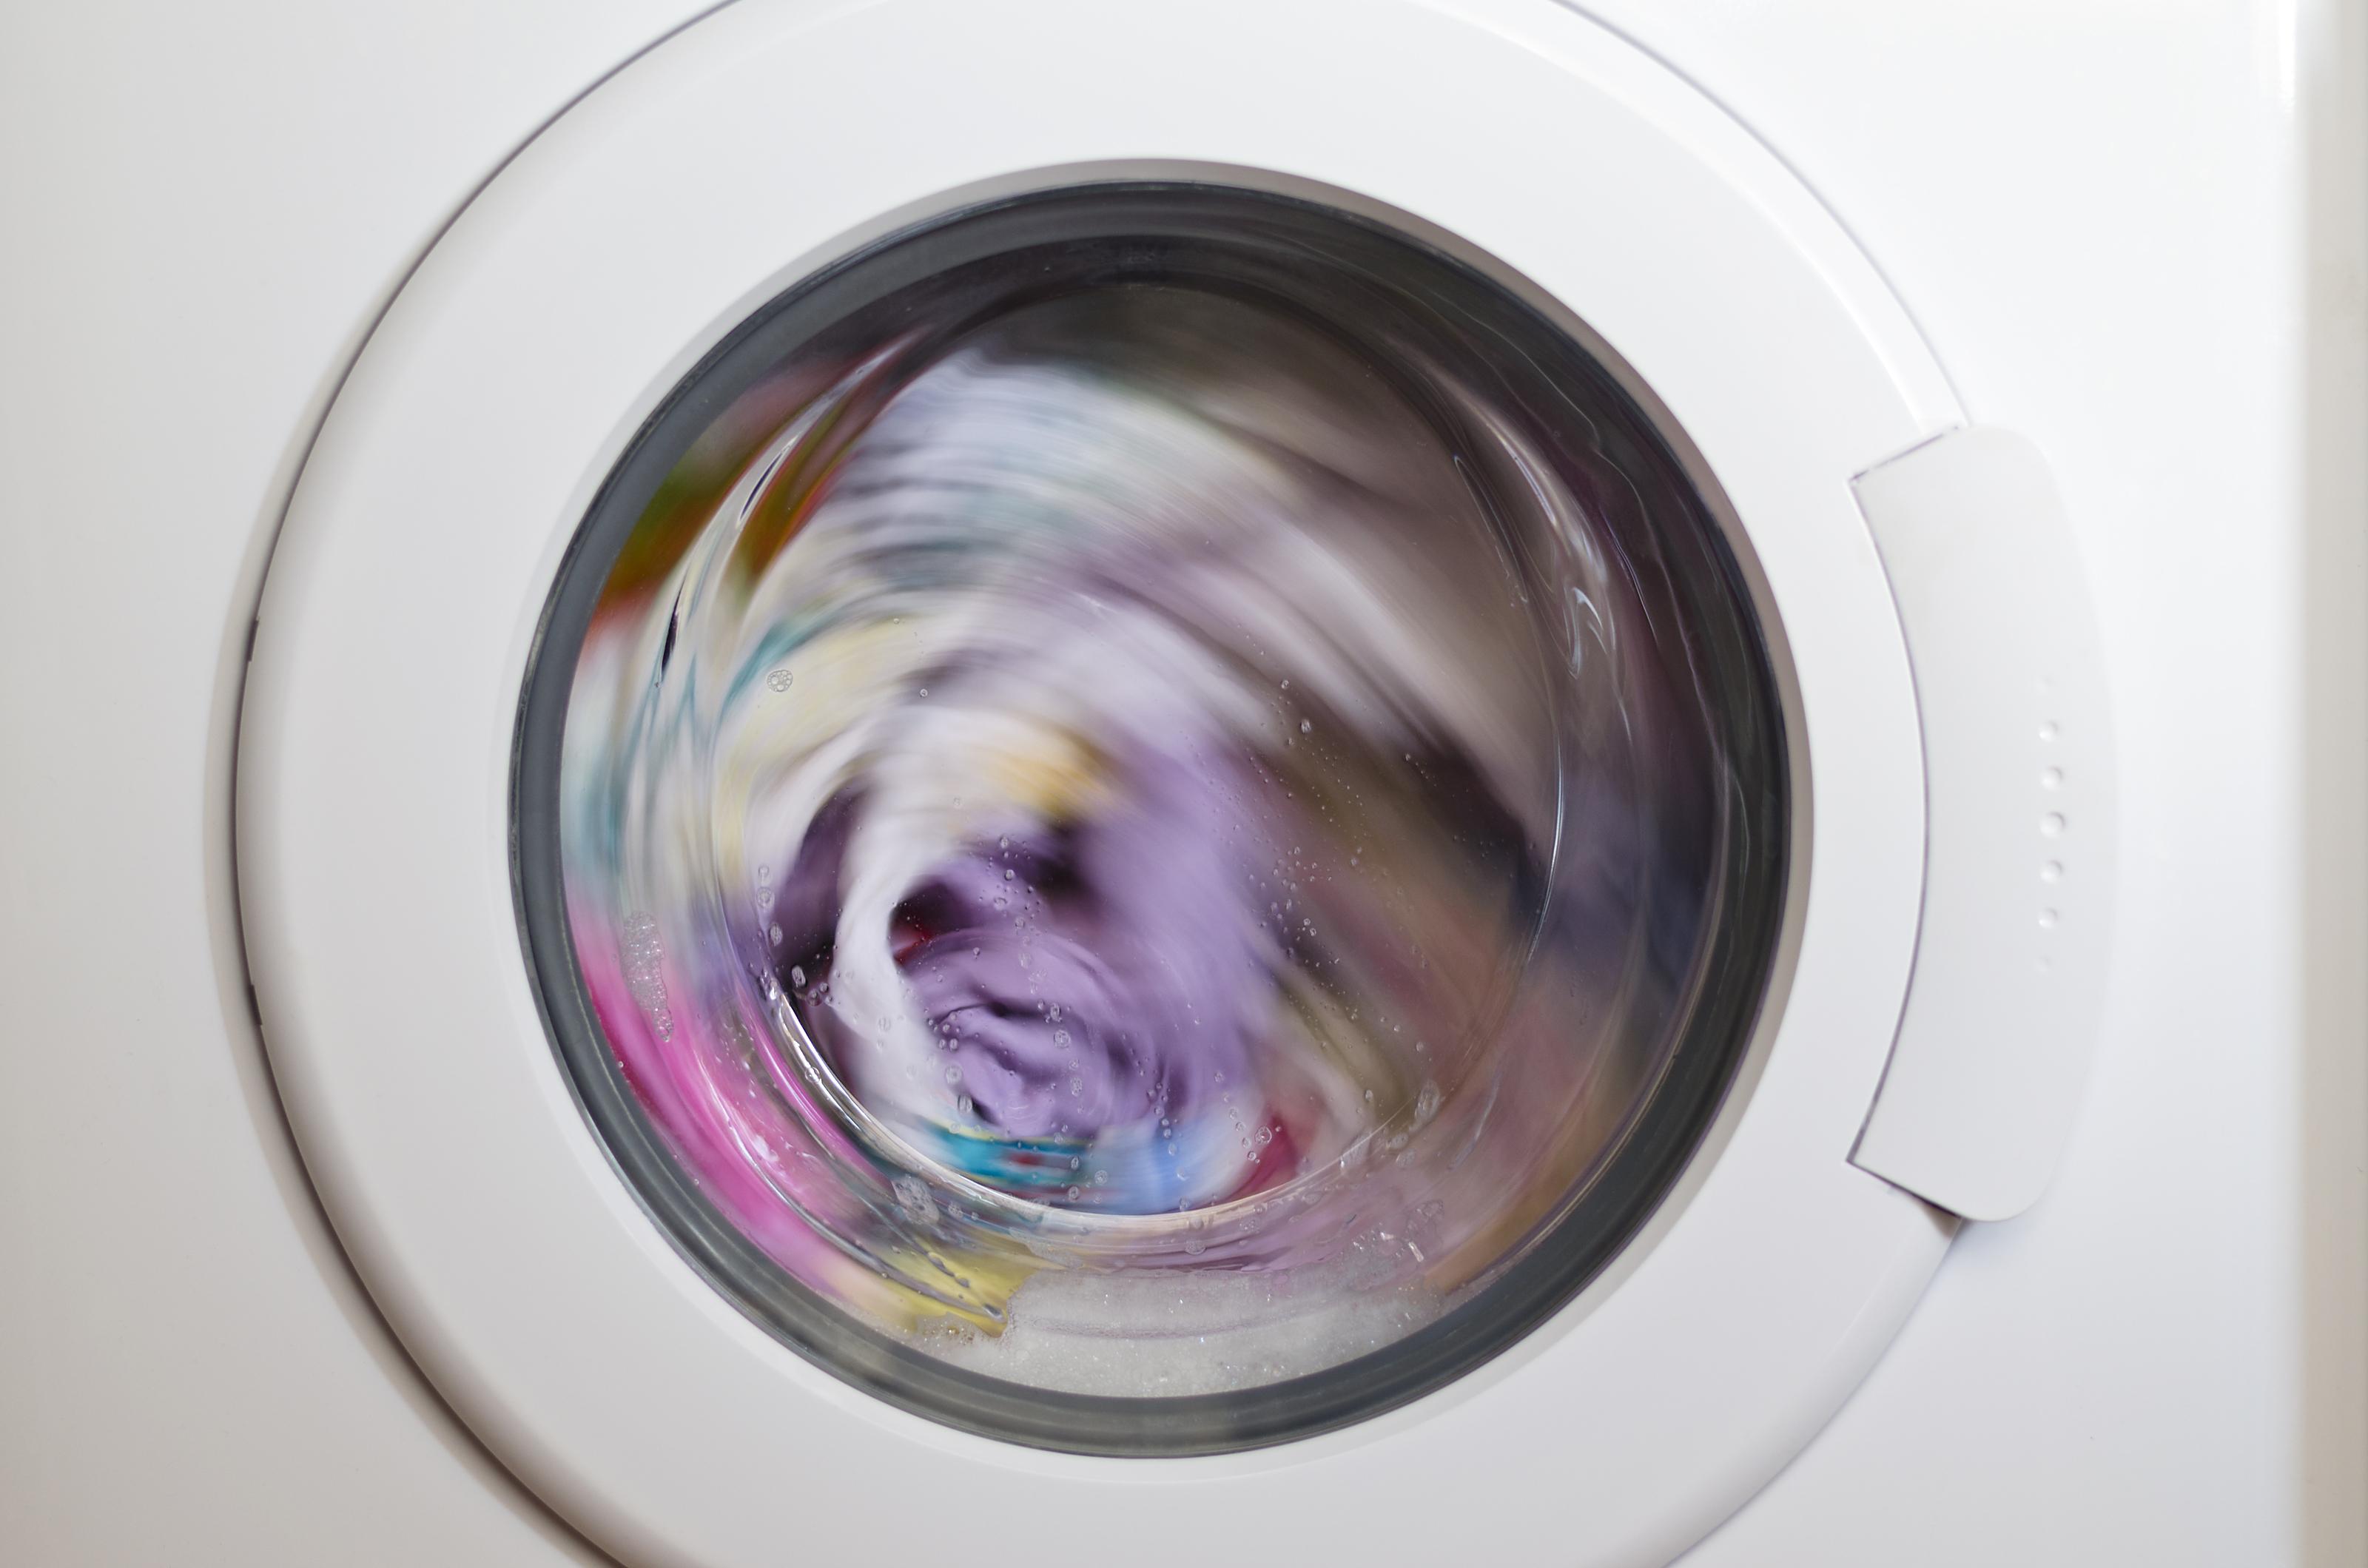 F24 Error Code on My Kenmore Washer | Hunker